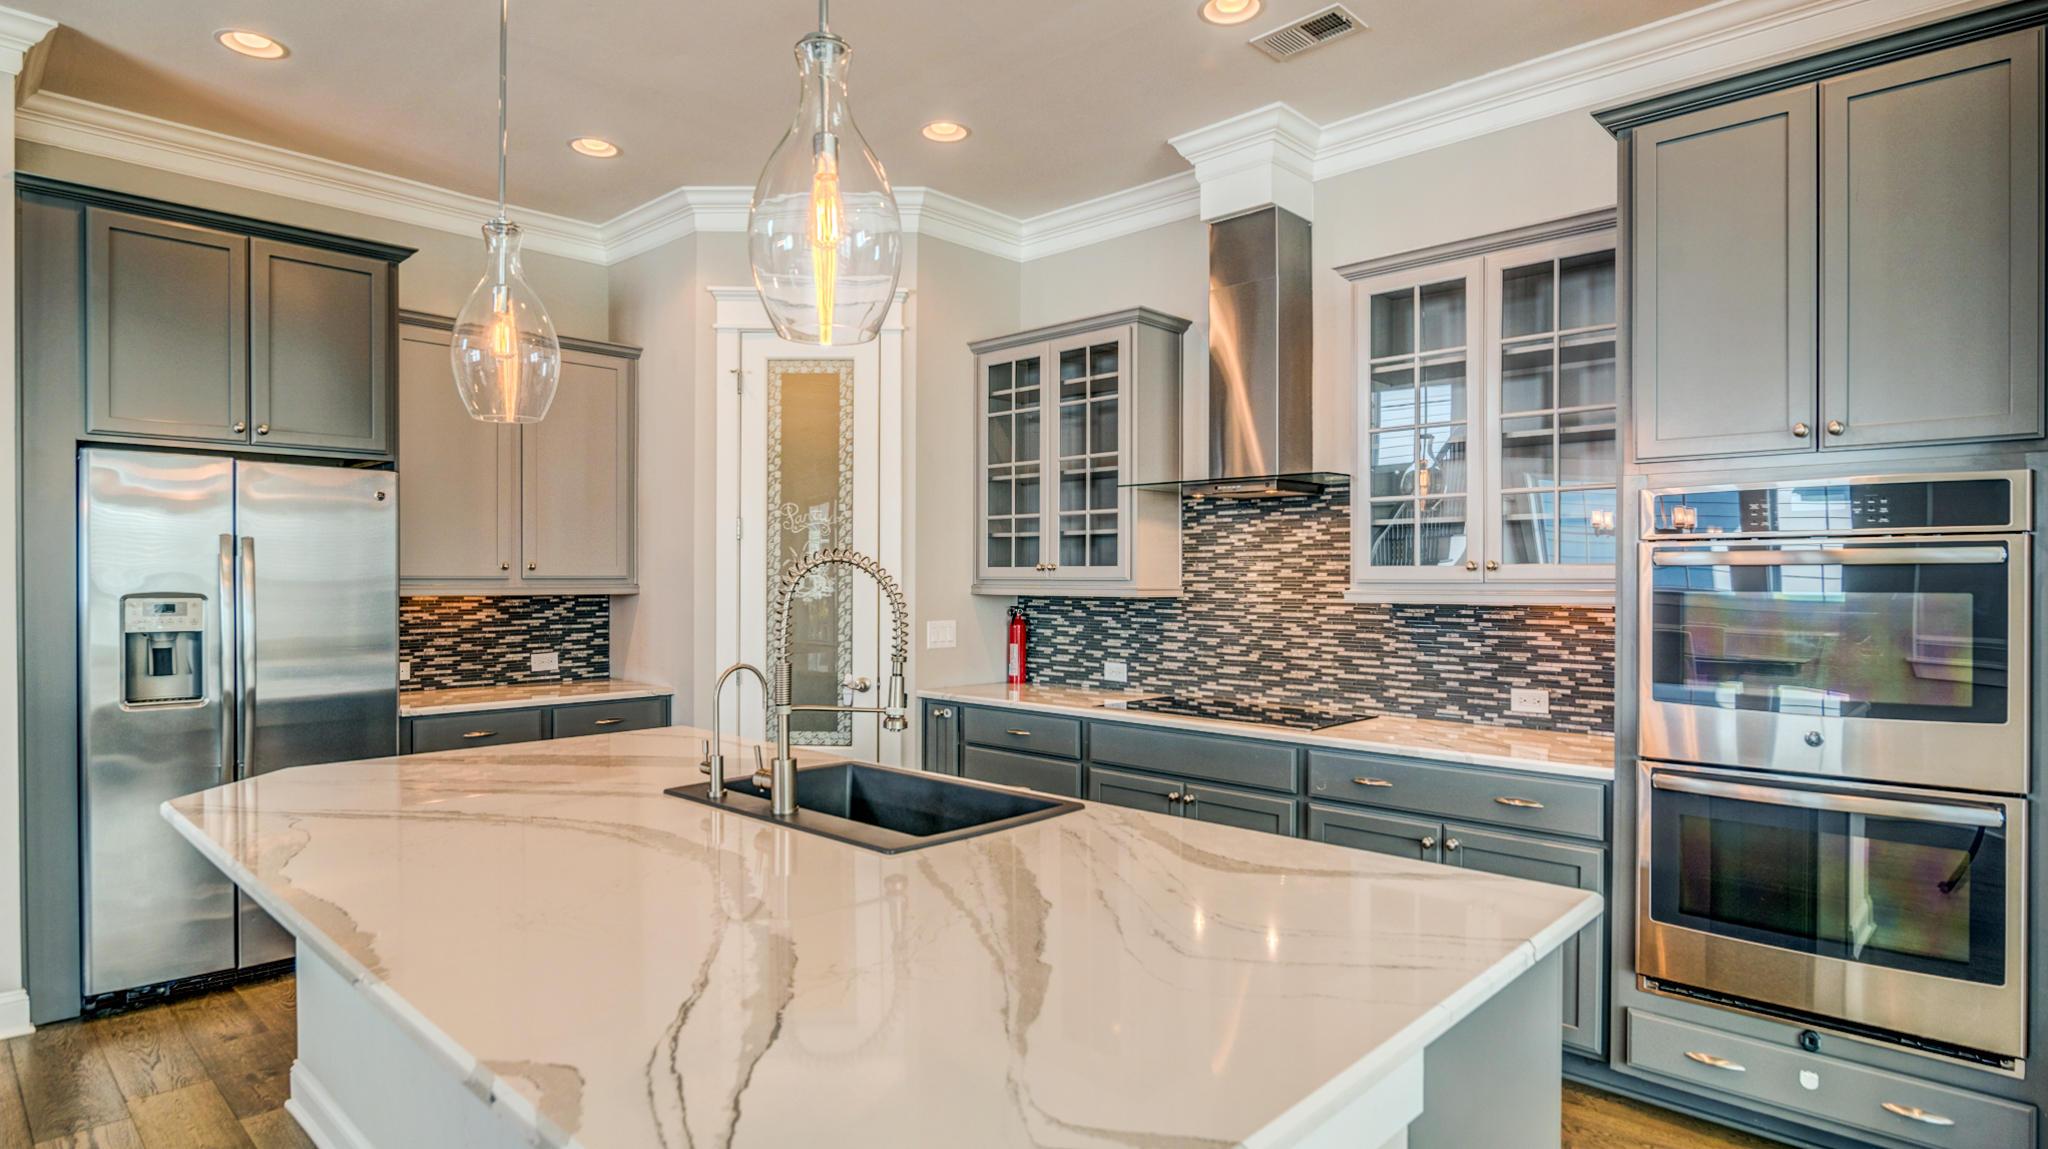 Carolina Park Homes For Sale - 3687 Spindrift, Mount Pleasant, SC - 13